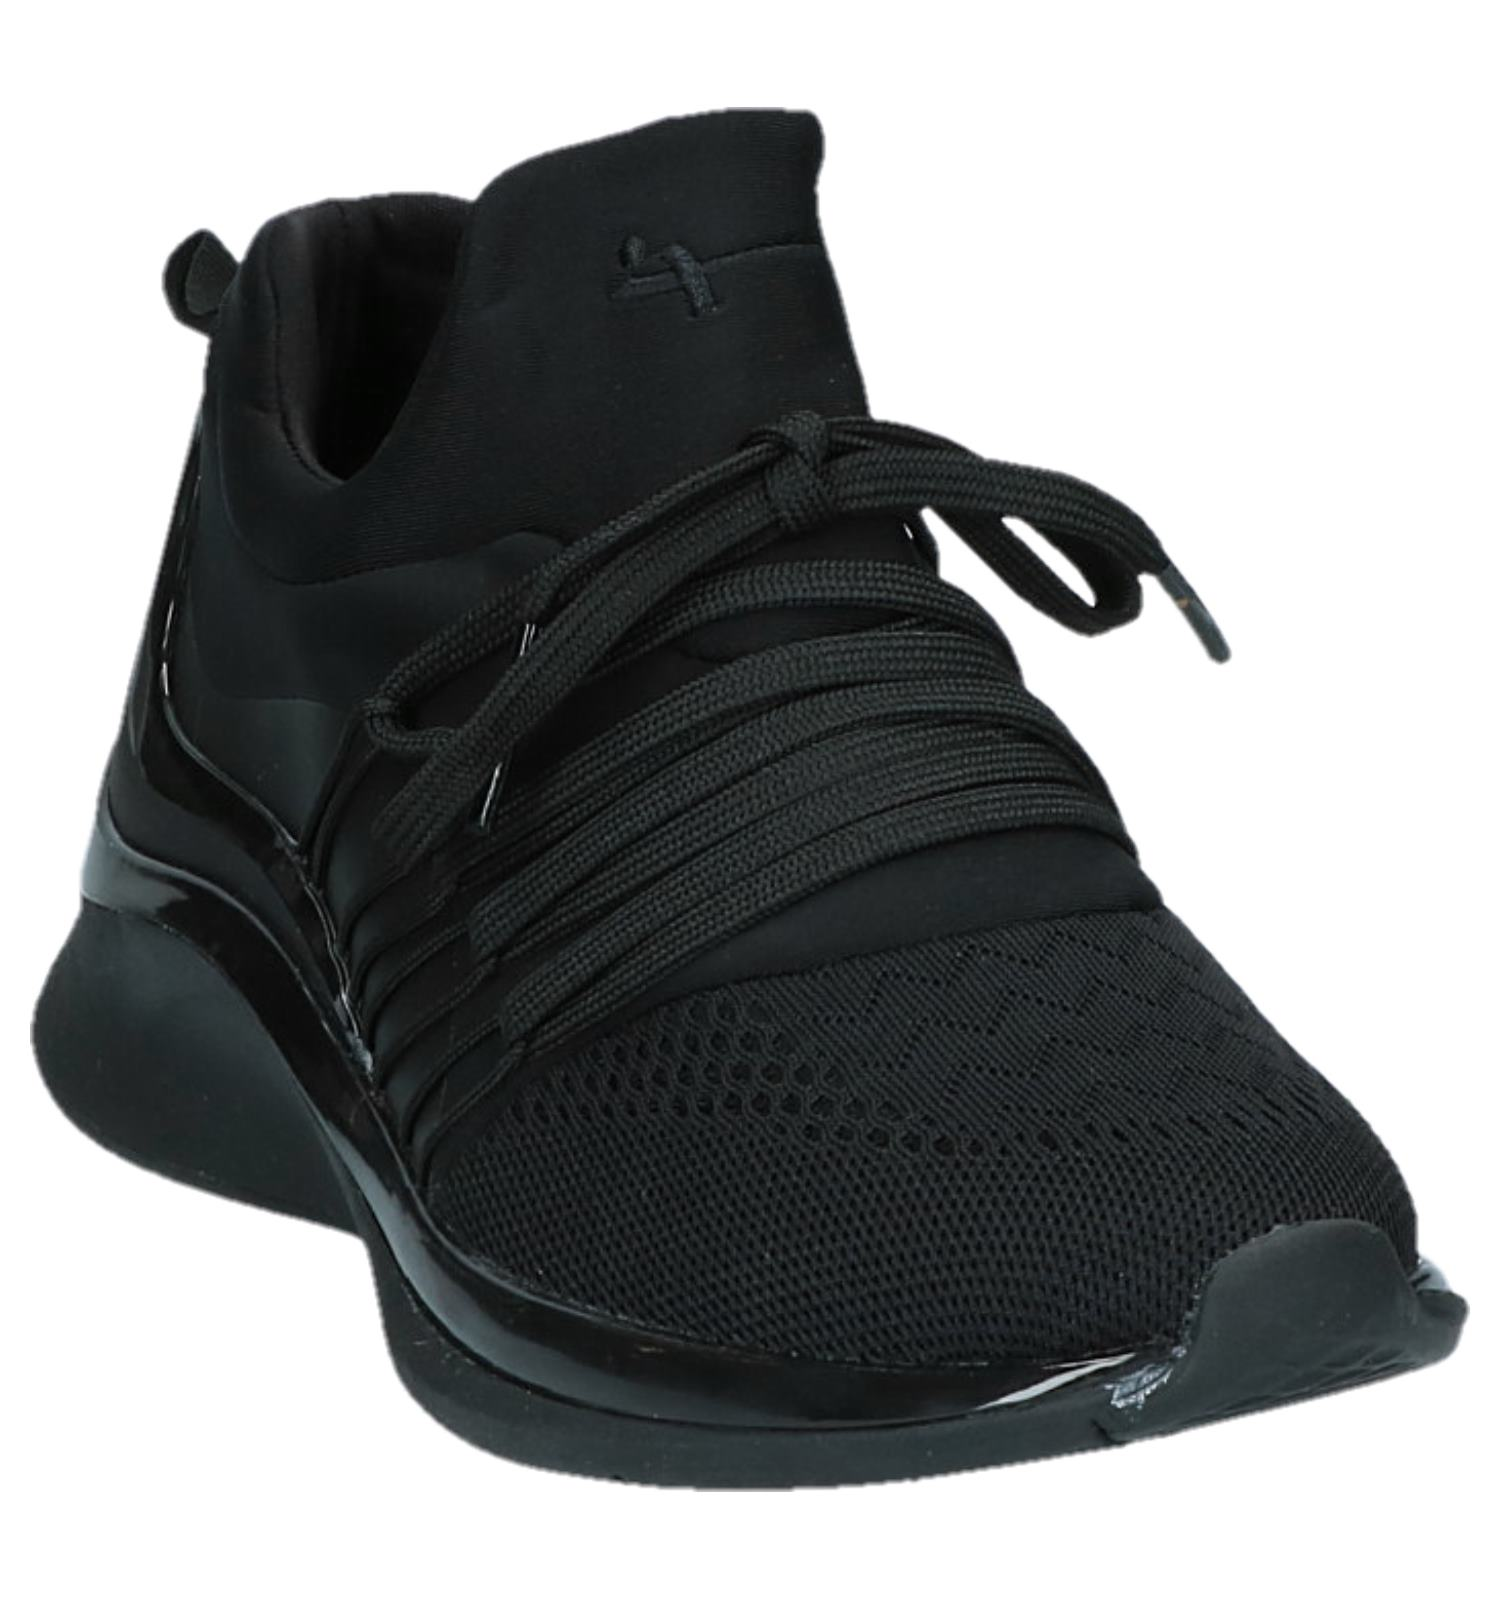 Tamaris Tamaris Fashletics Zwarte Tamaris Sneakers Zwarte Sneakers Sneakers Fashletics Zwarte Tamaris Fashletics c3AjLq54SR